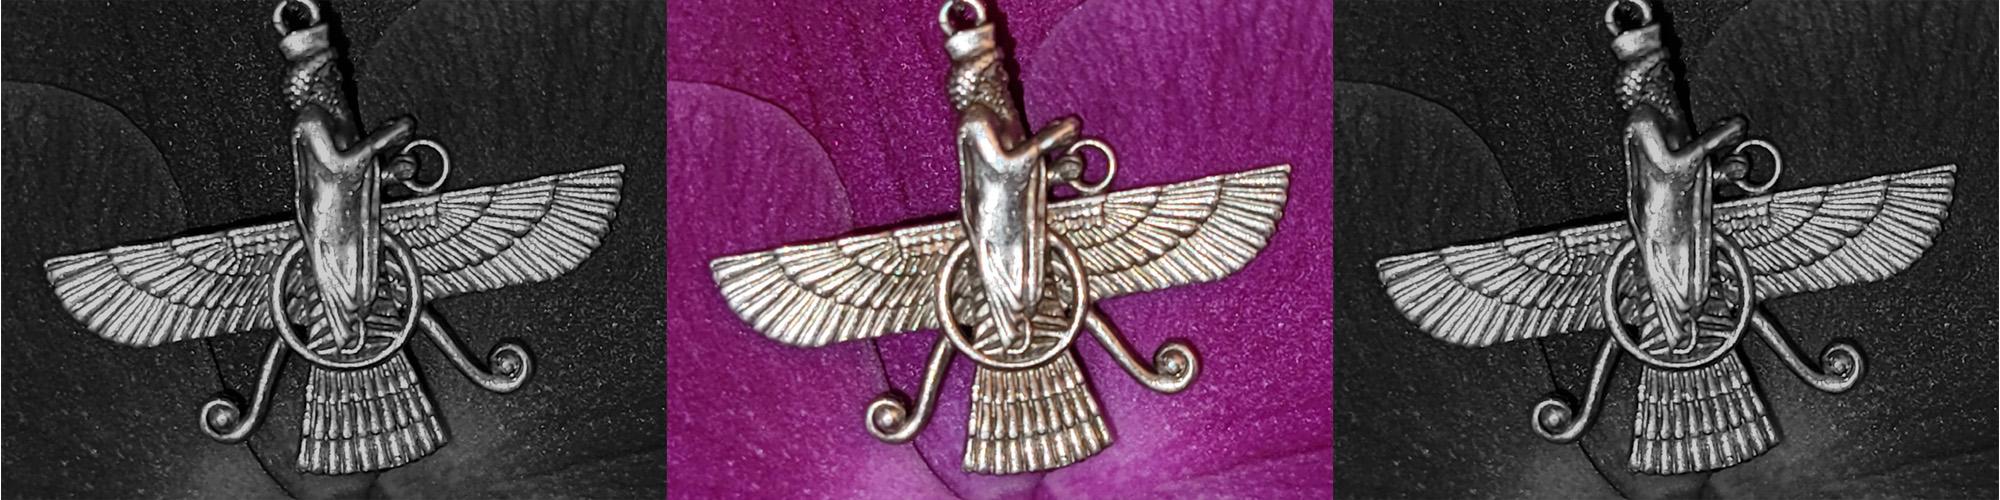 Zoroastrian Association of Florida